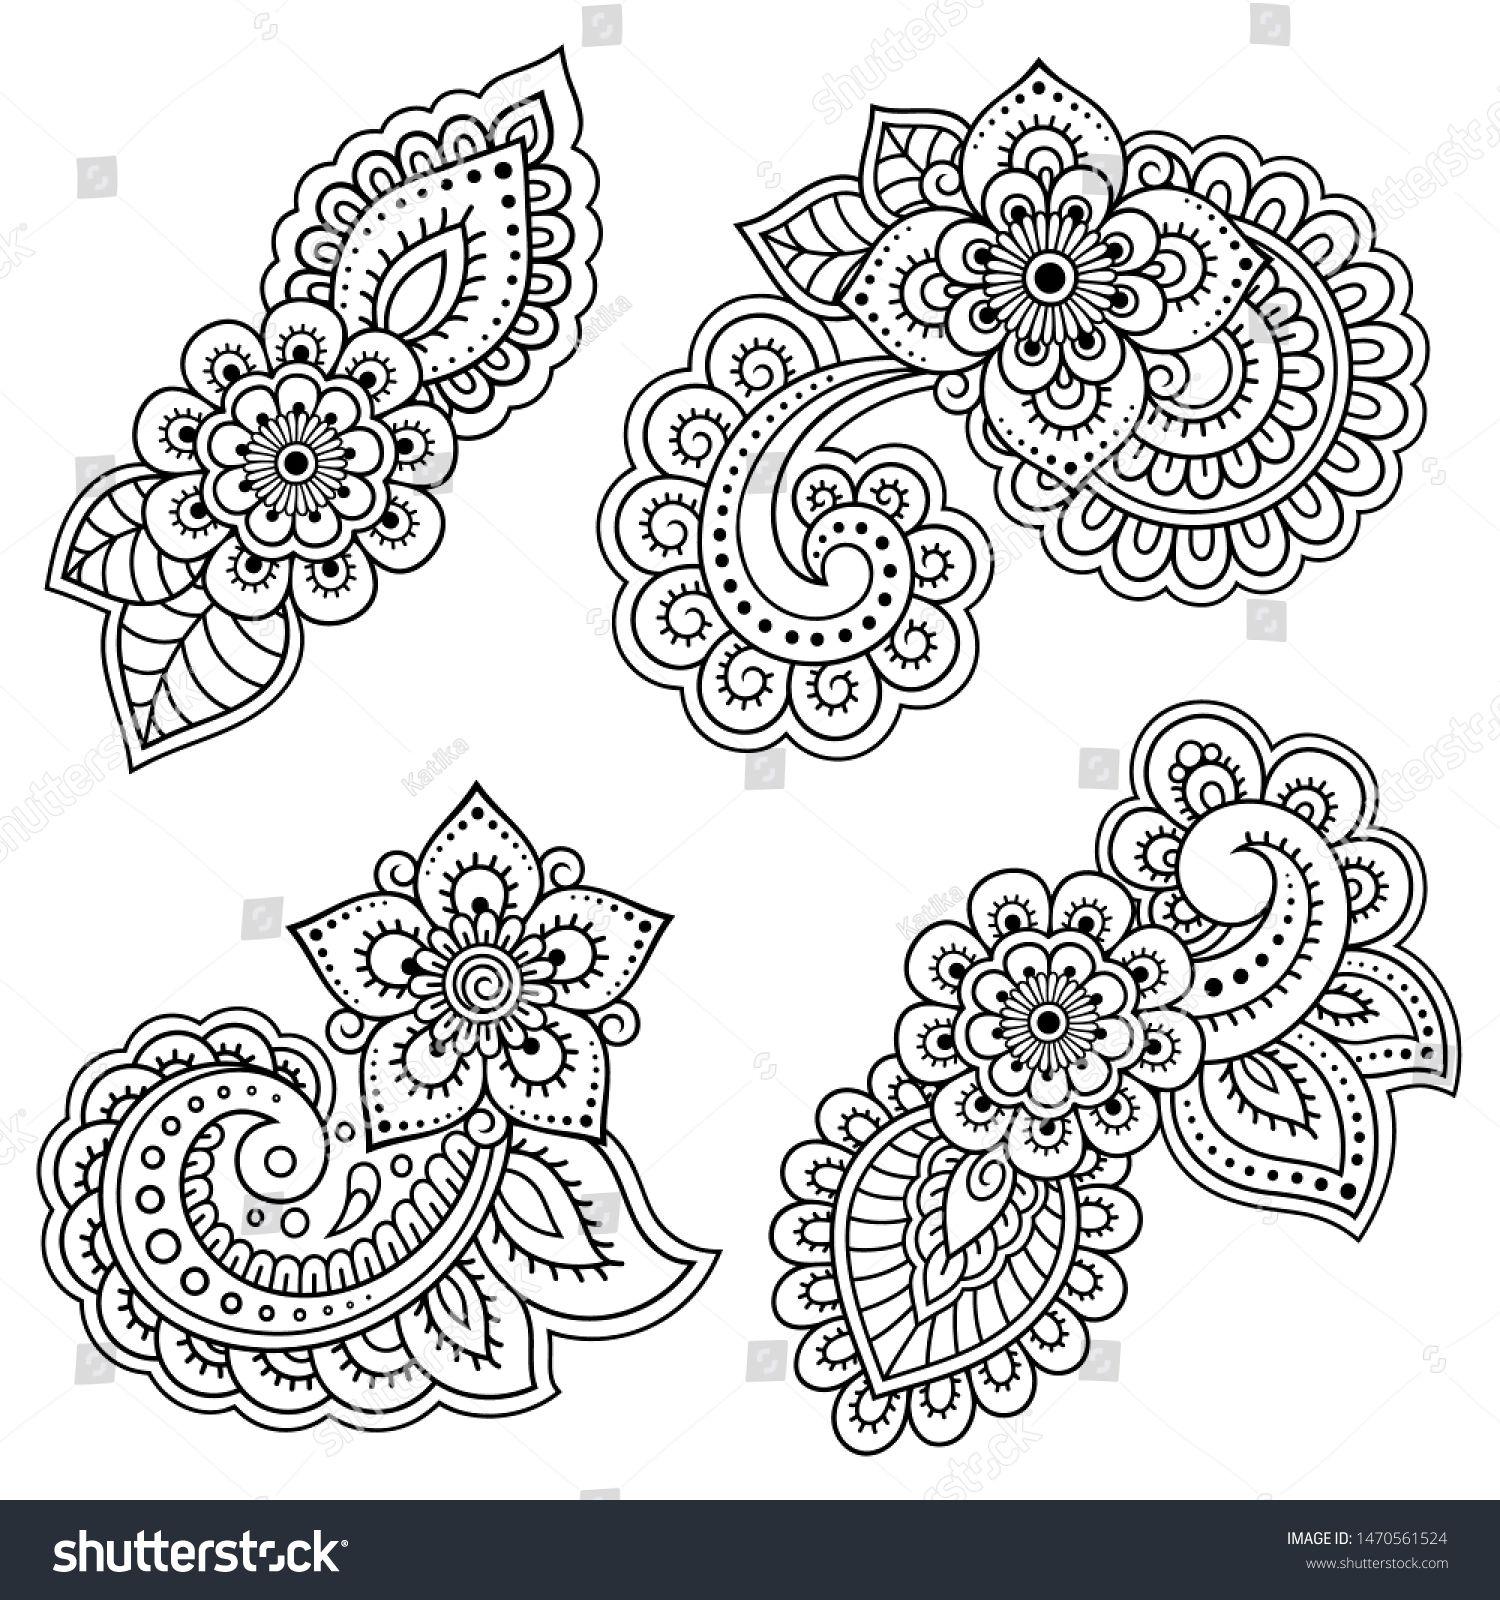 Vetor stock de Set Mehndi Flower Pattern Henna Drawing (livre de direitos) 1470561524